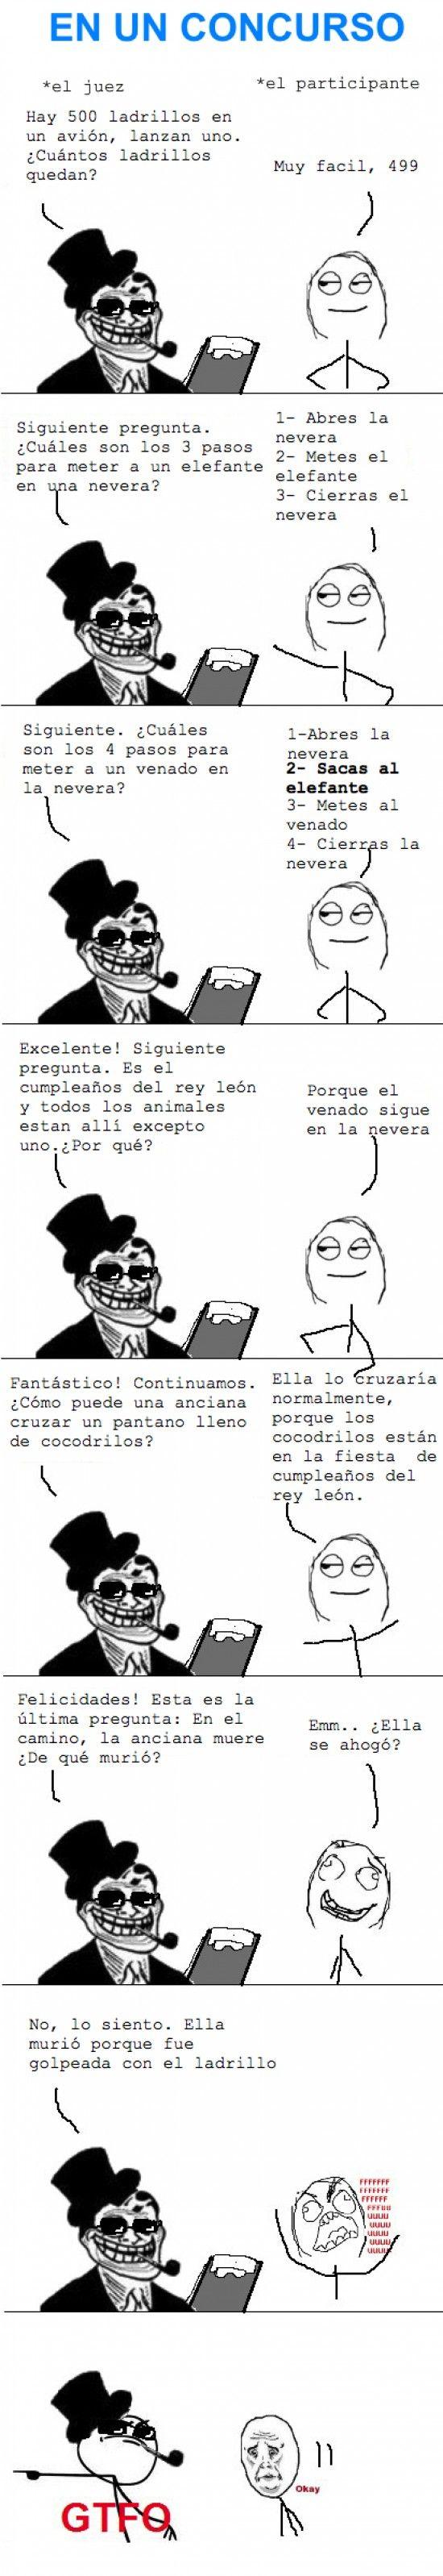 Trollface - Concurso troll.